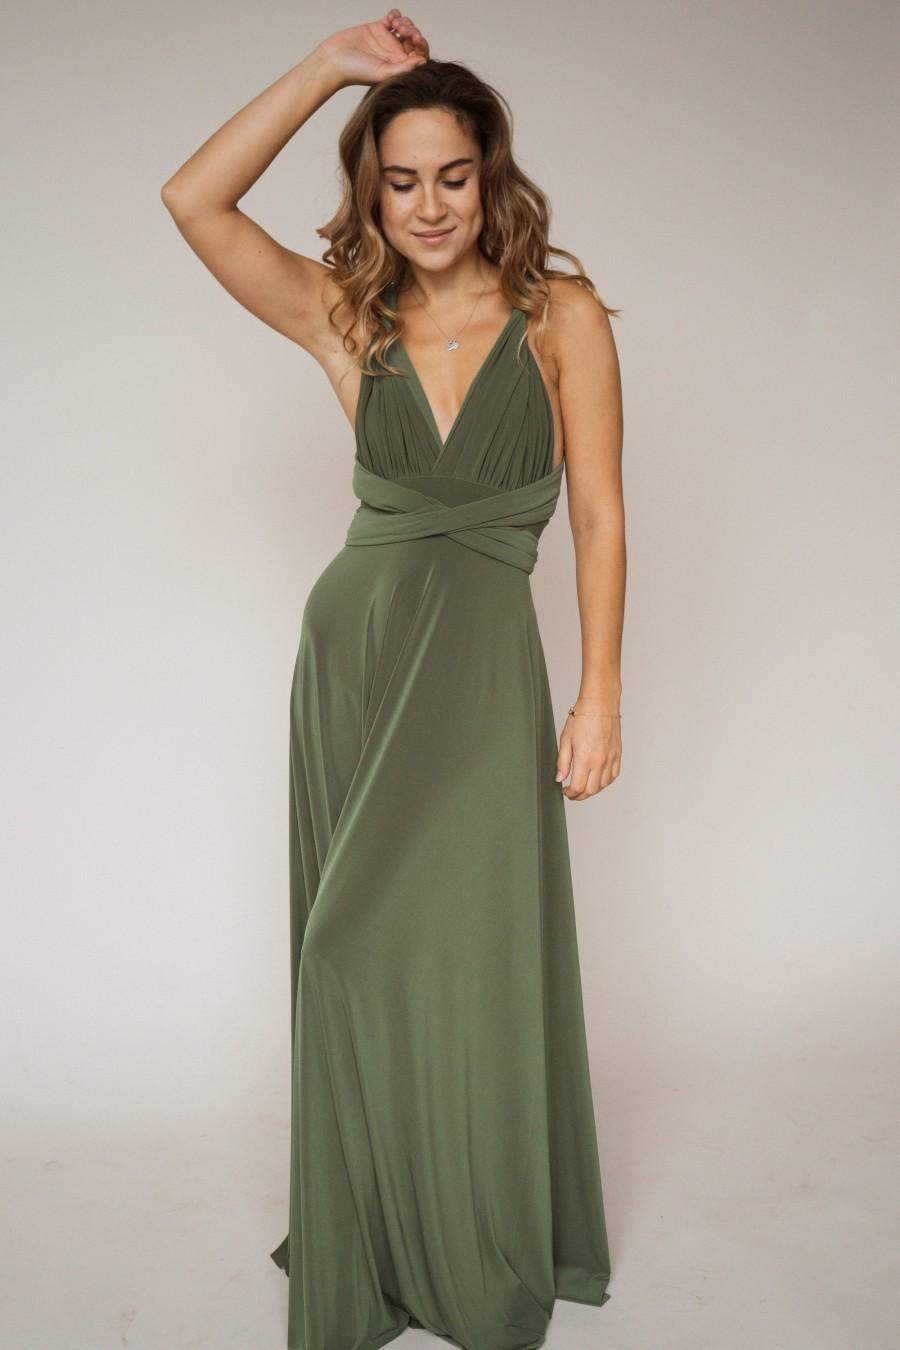 Wedding - Olive green bridesmaid dress, green dress, bridesmaids, olive green dress, long green dress, green bridesmaid dress, olive green bridesmaids